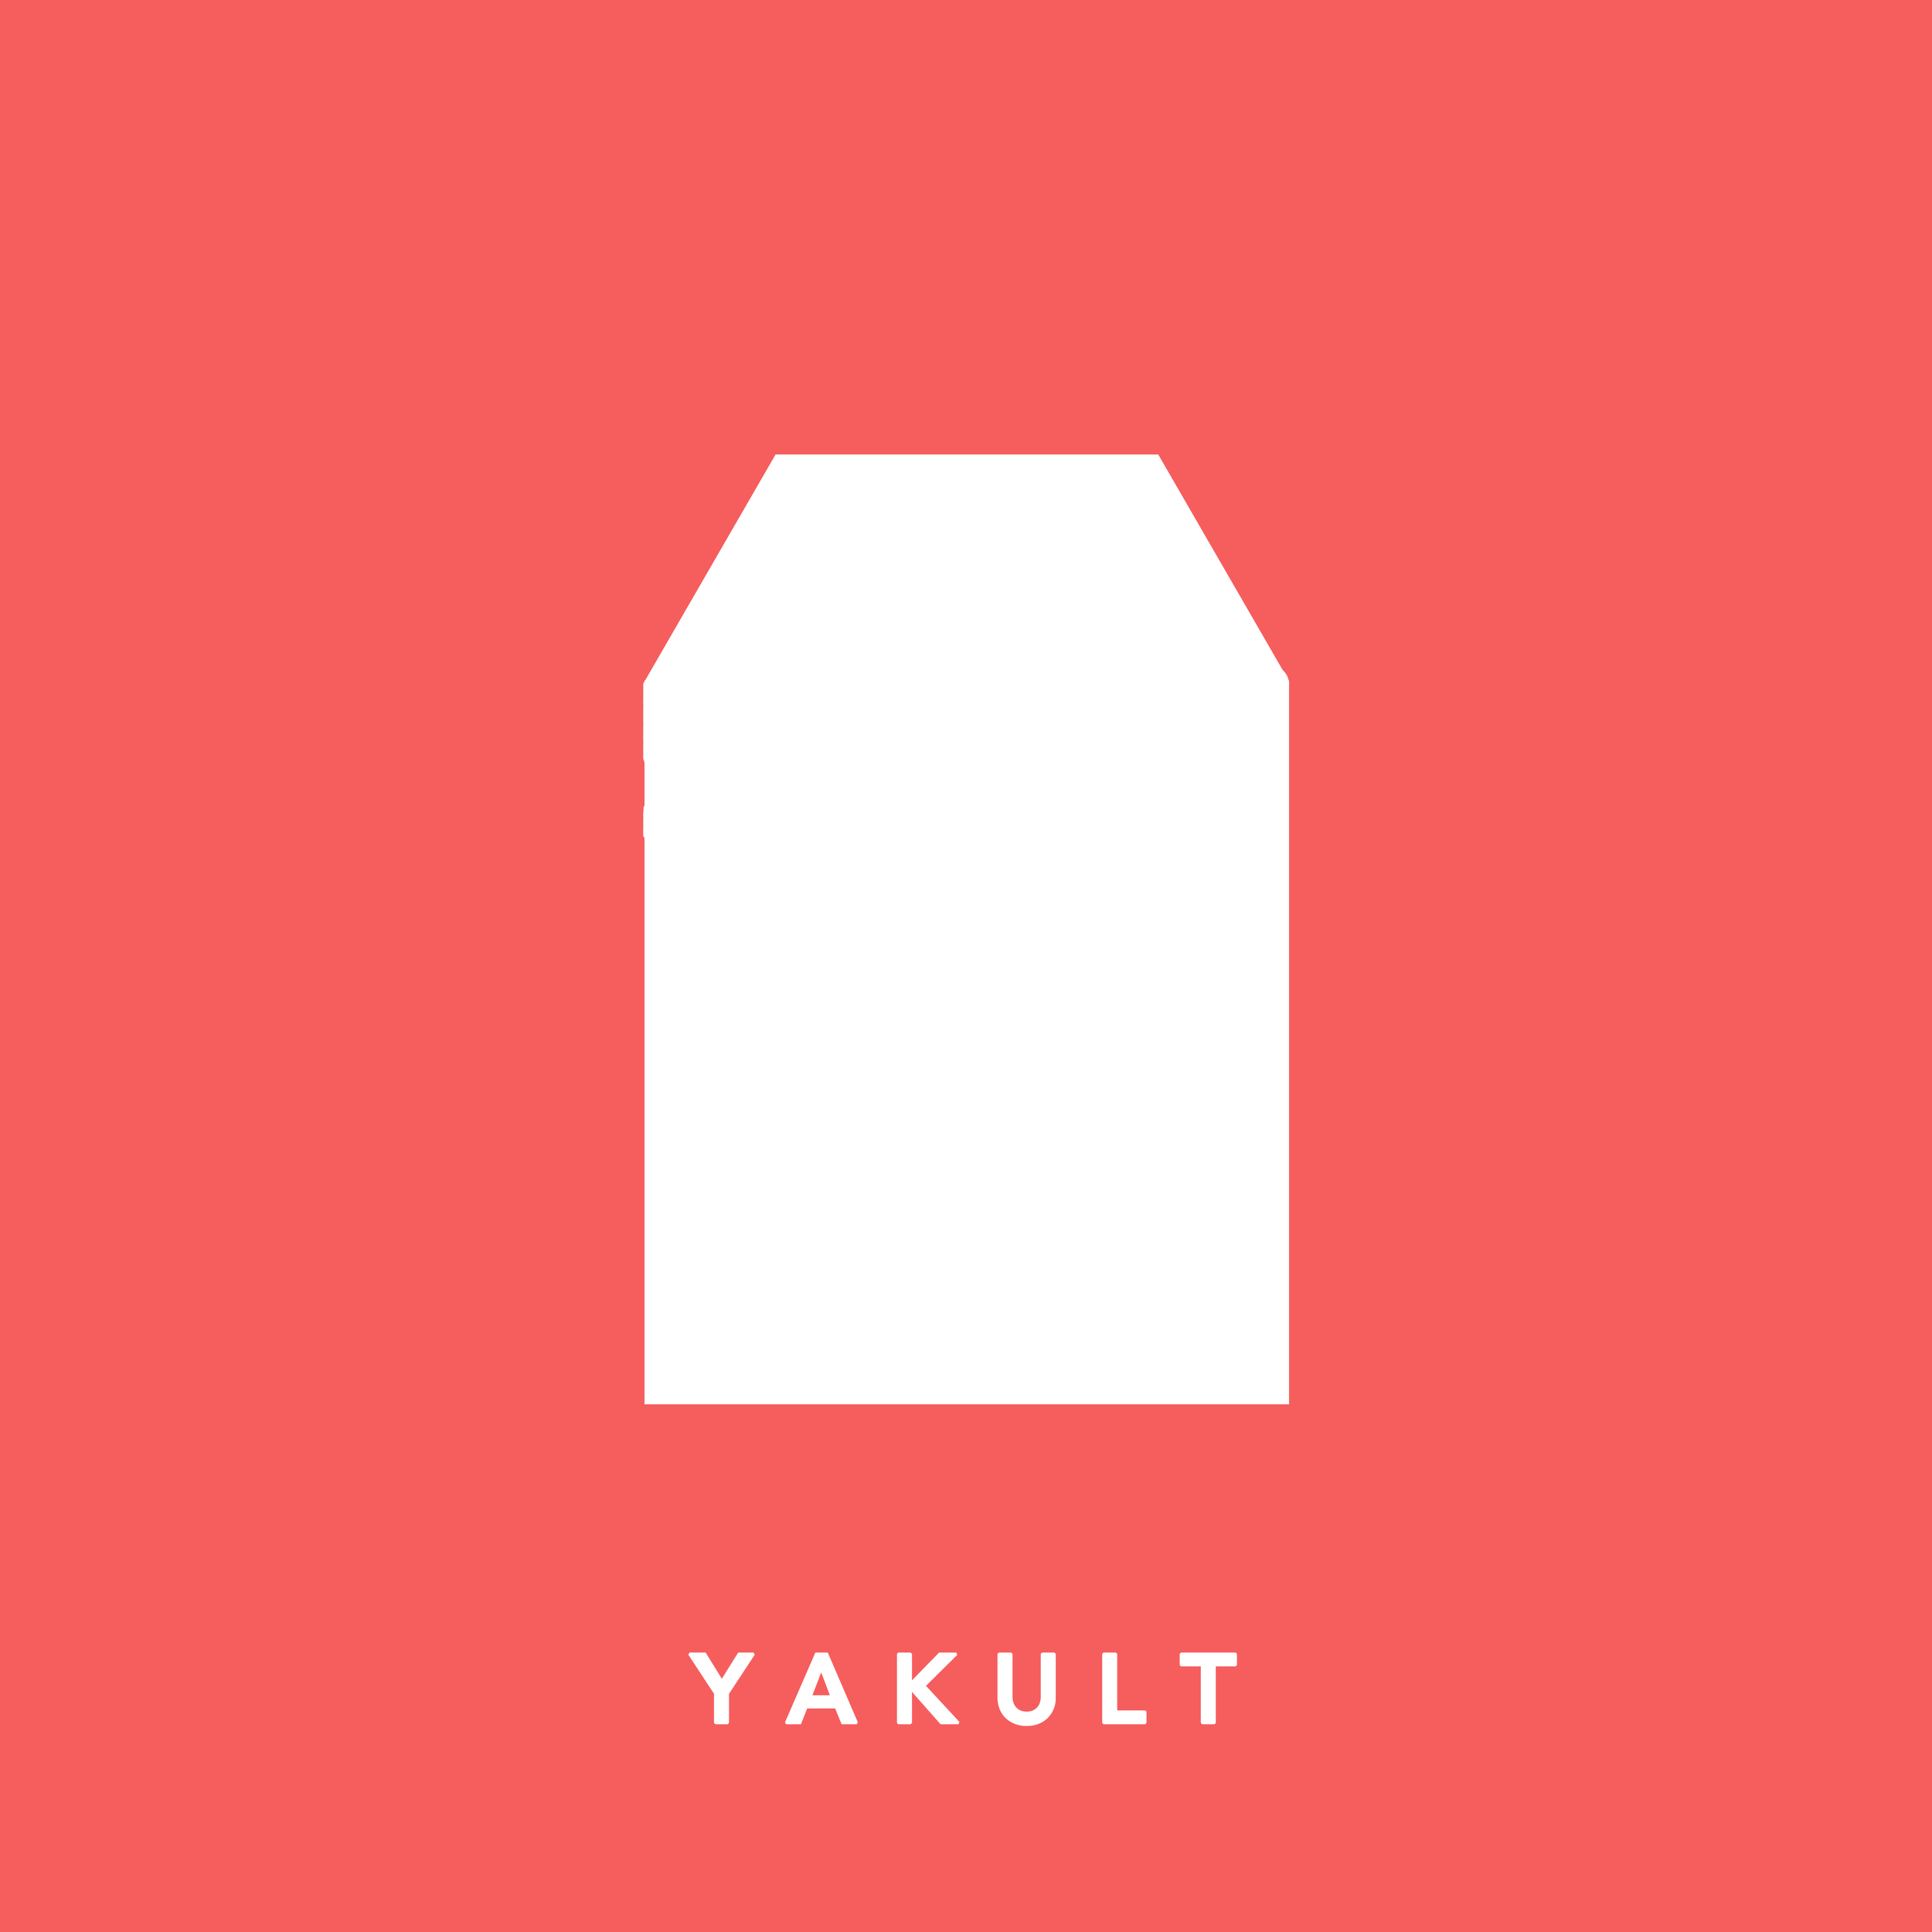 03. YAKULT.png